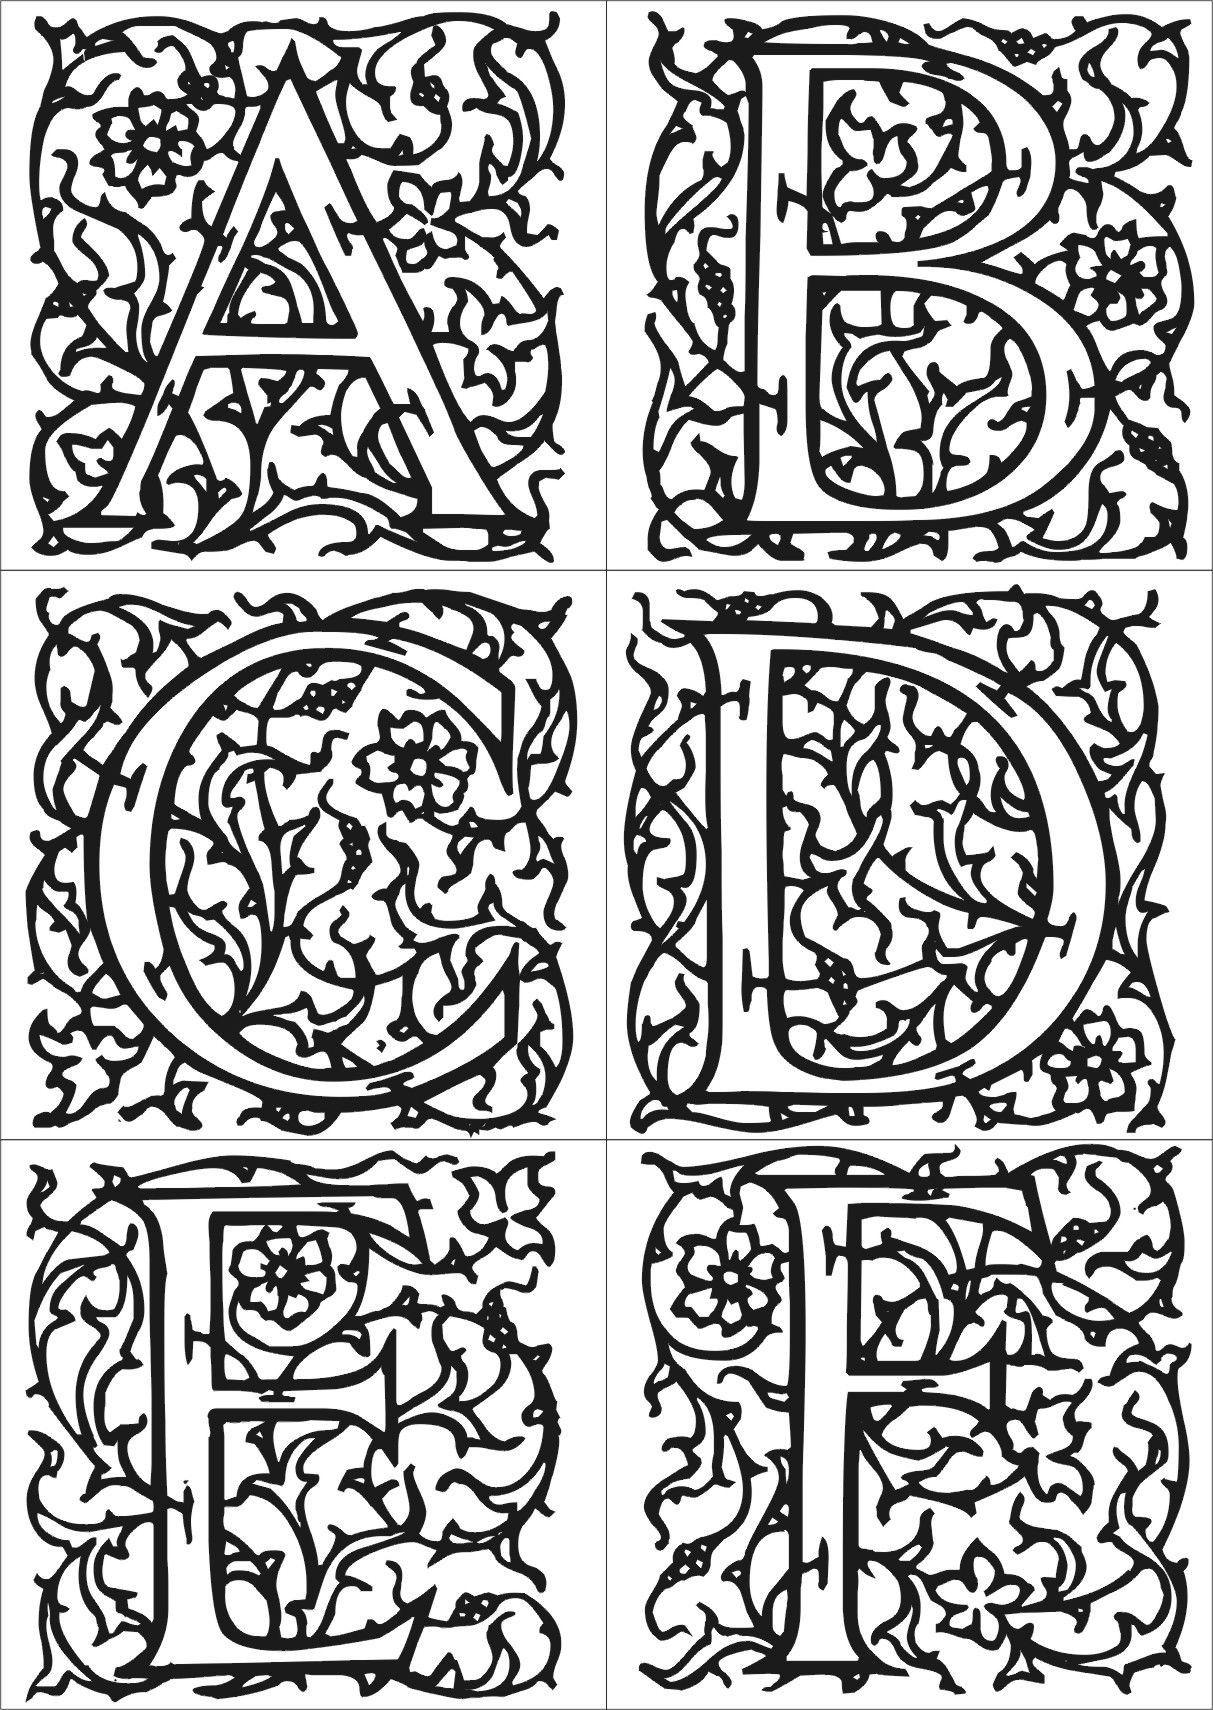 Alphabet Moyen Age A Imprimer Lovely Les Enluminures Le